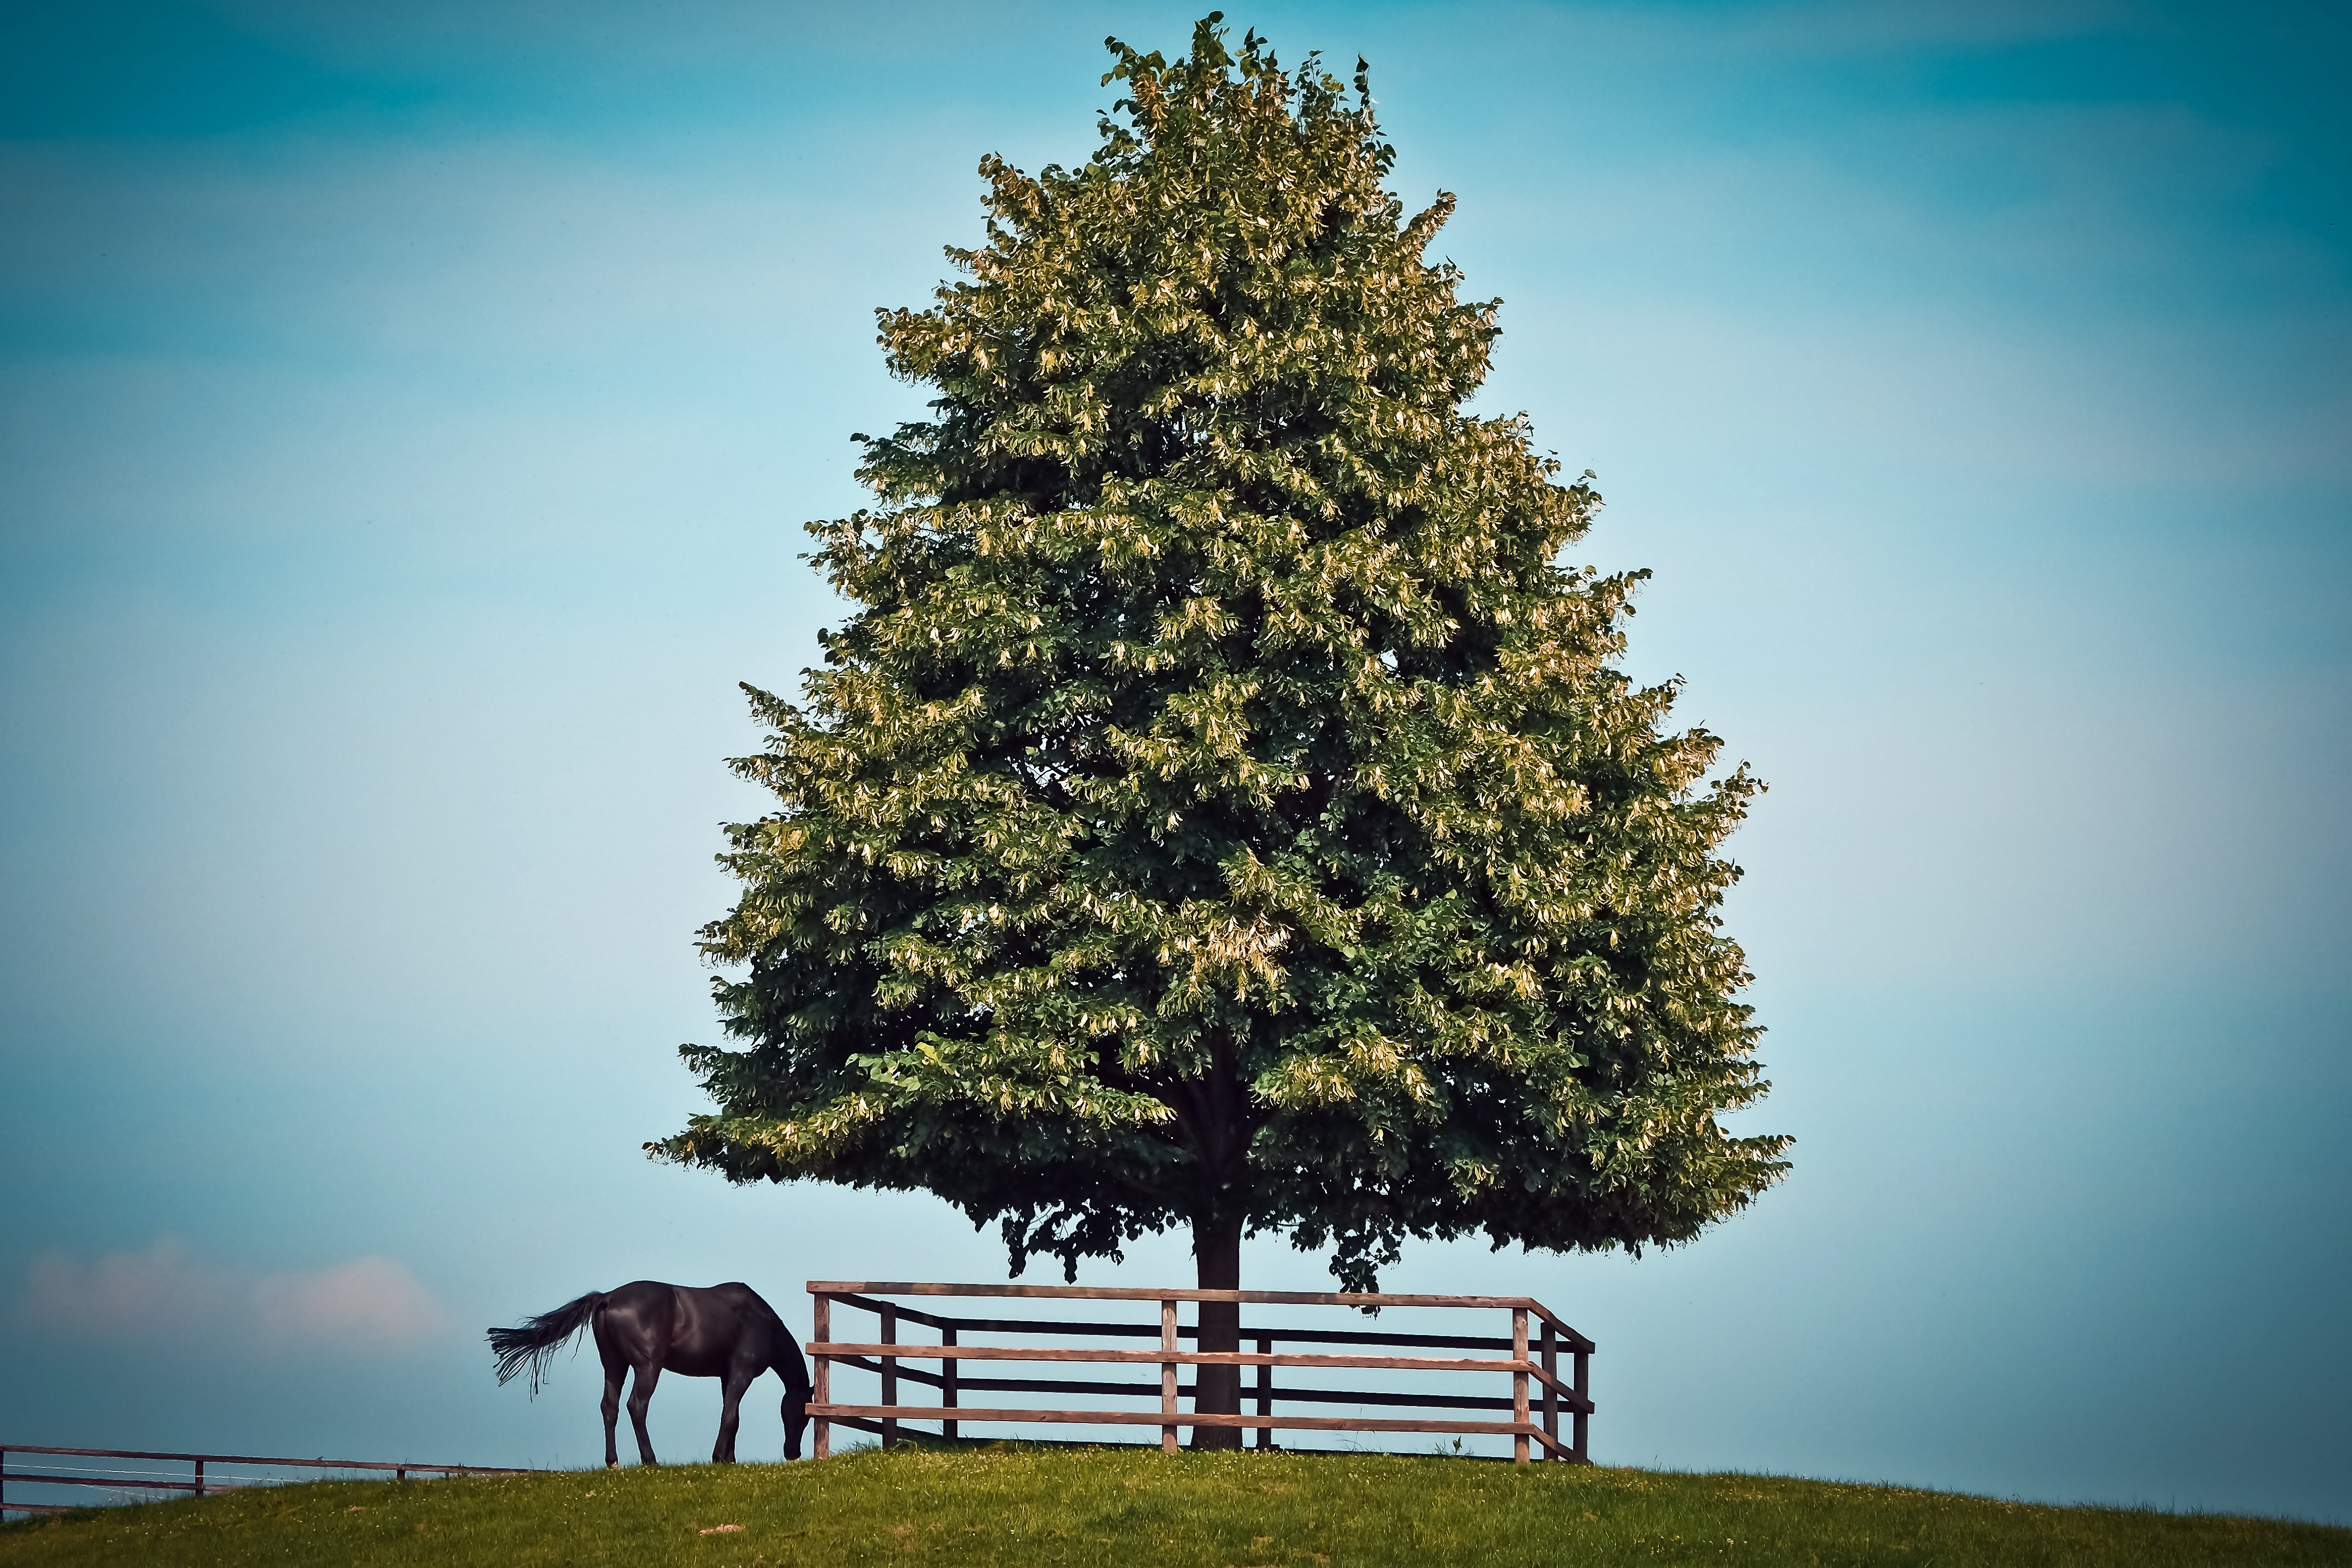 Black horse beside green leave tree photo